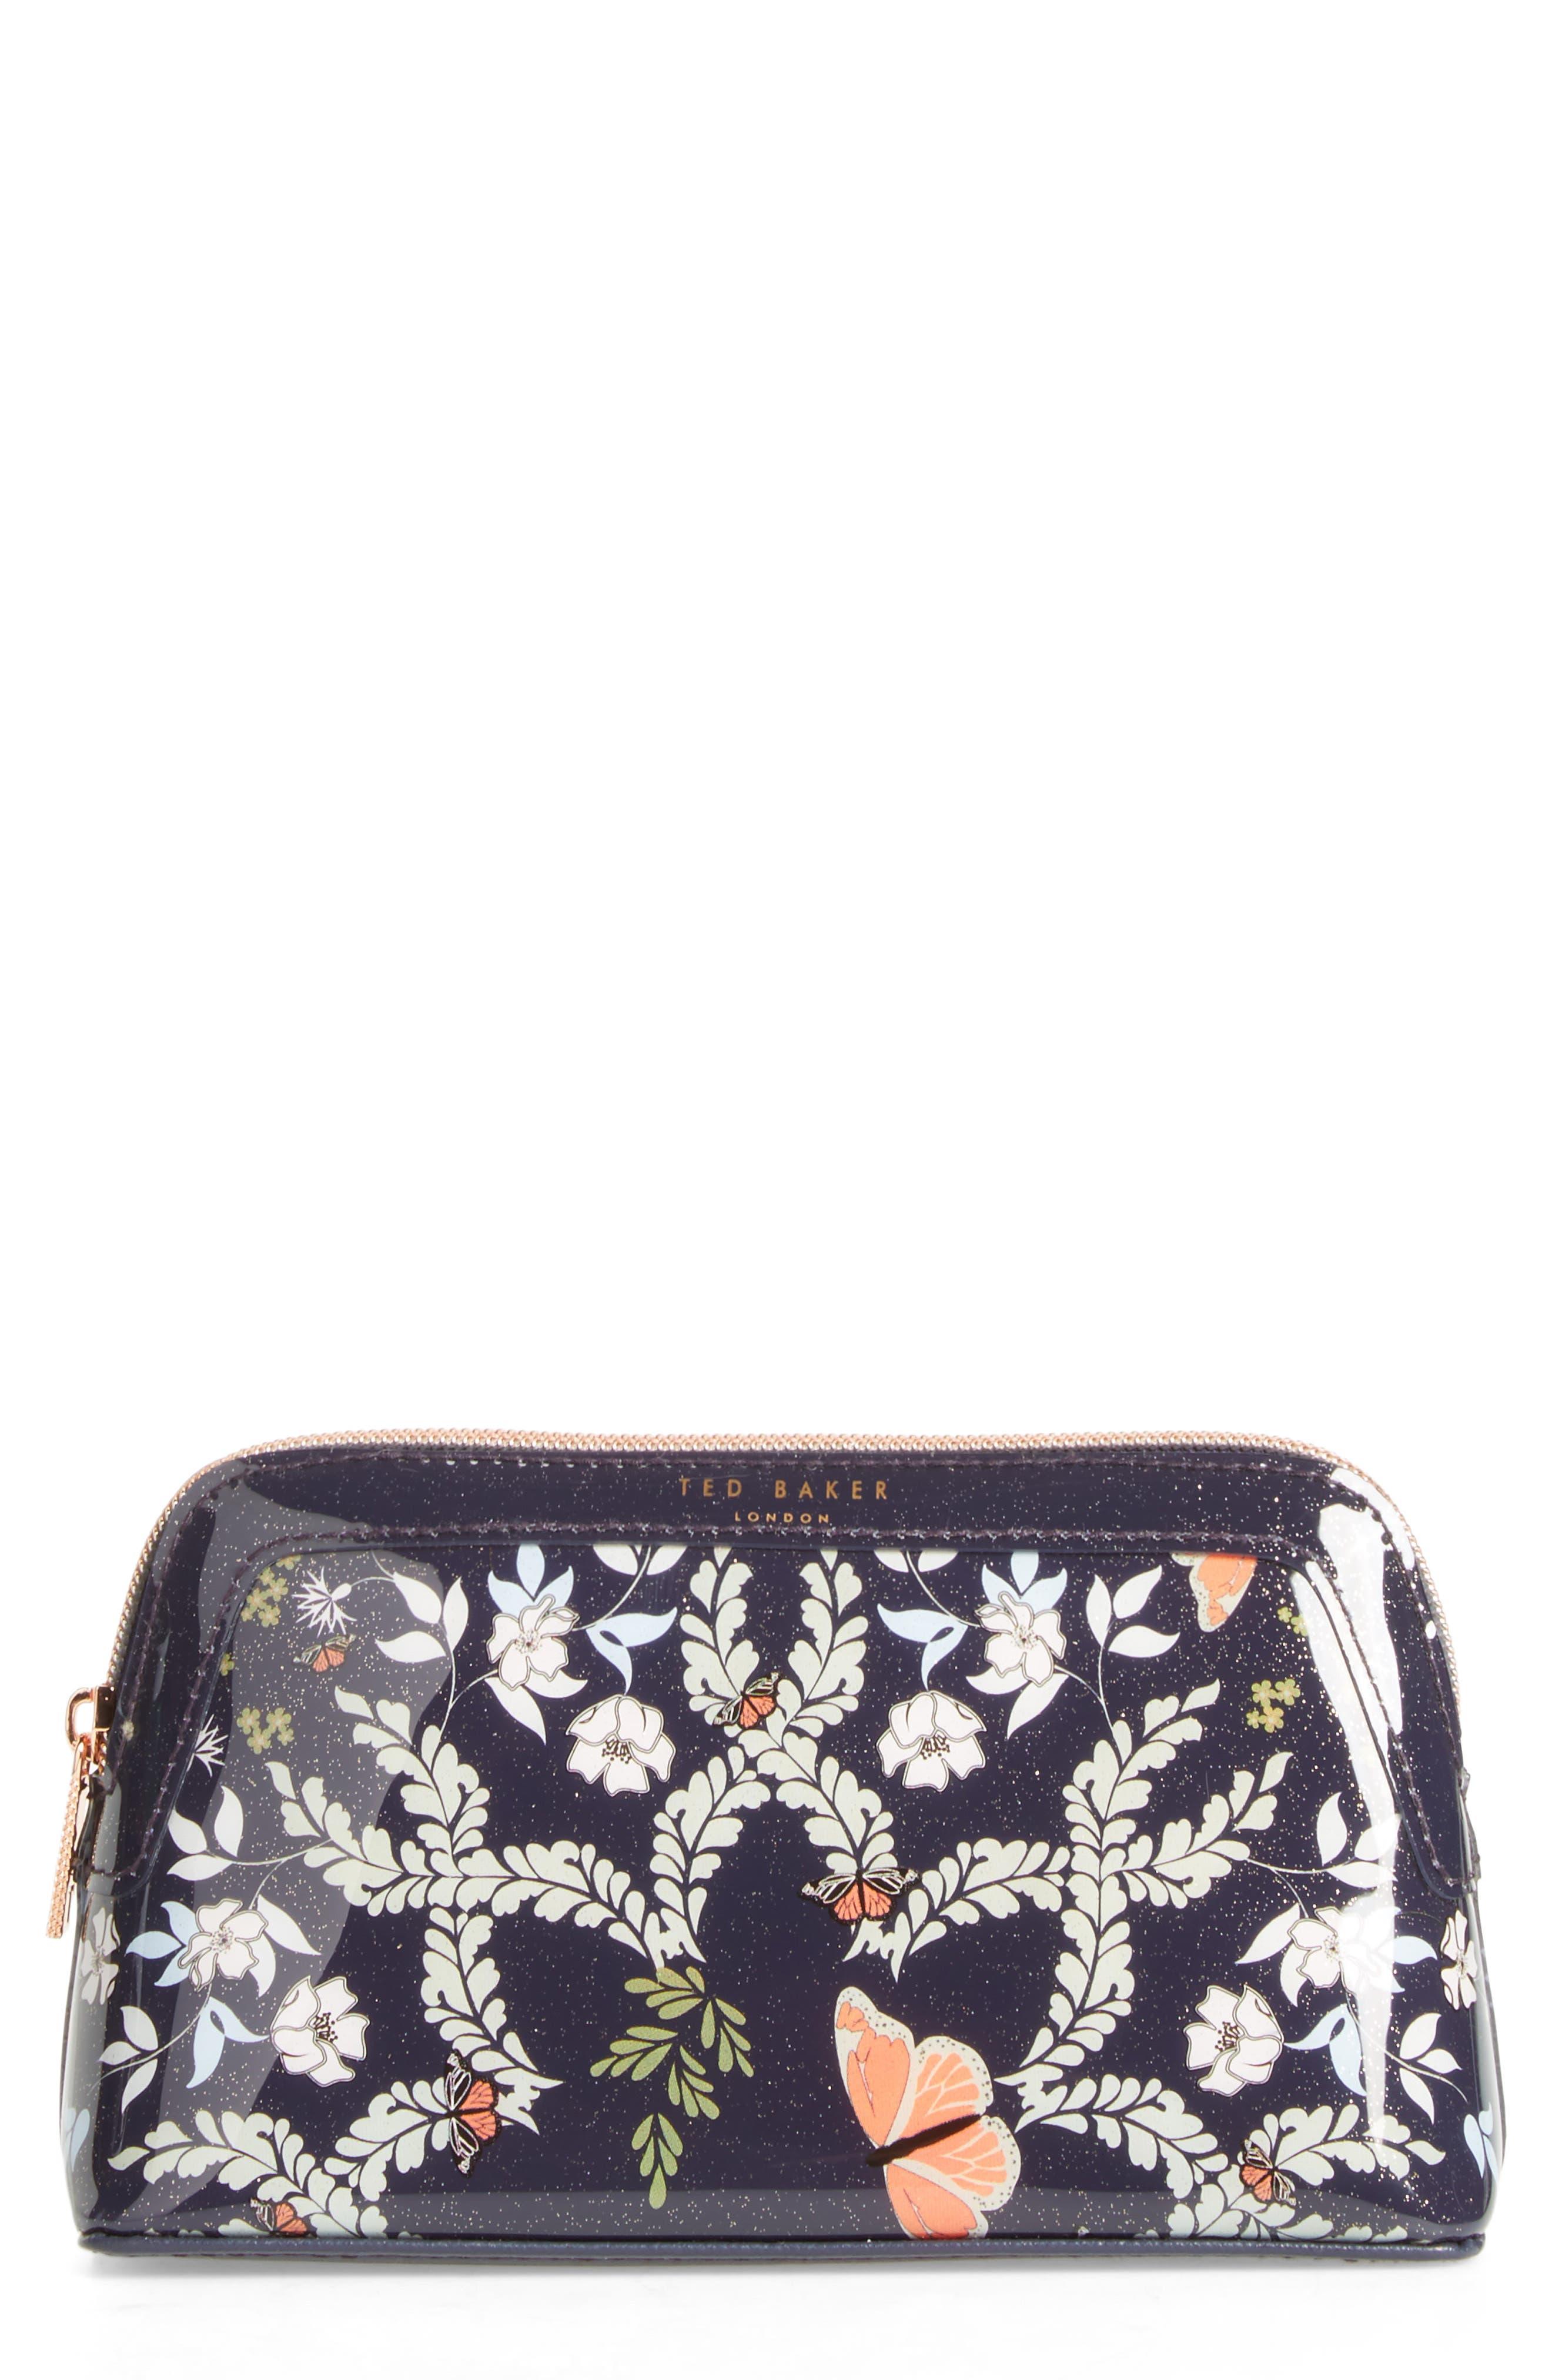 Ted Baker London Lennita- Kyoto Gardens Cosmetics Bag